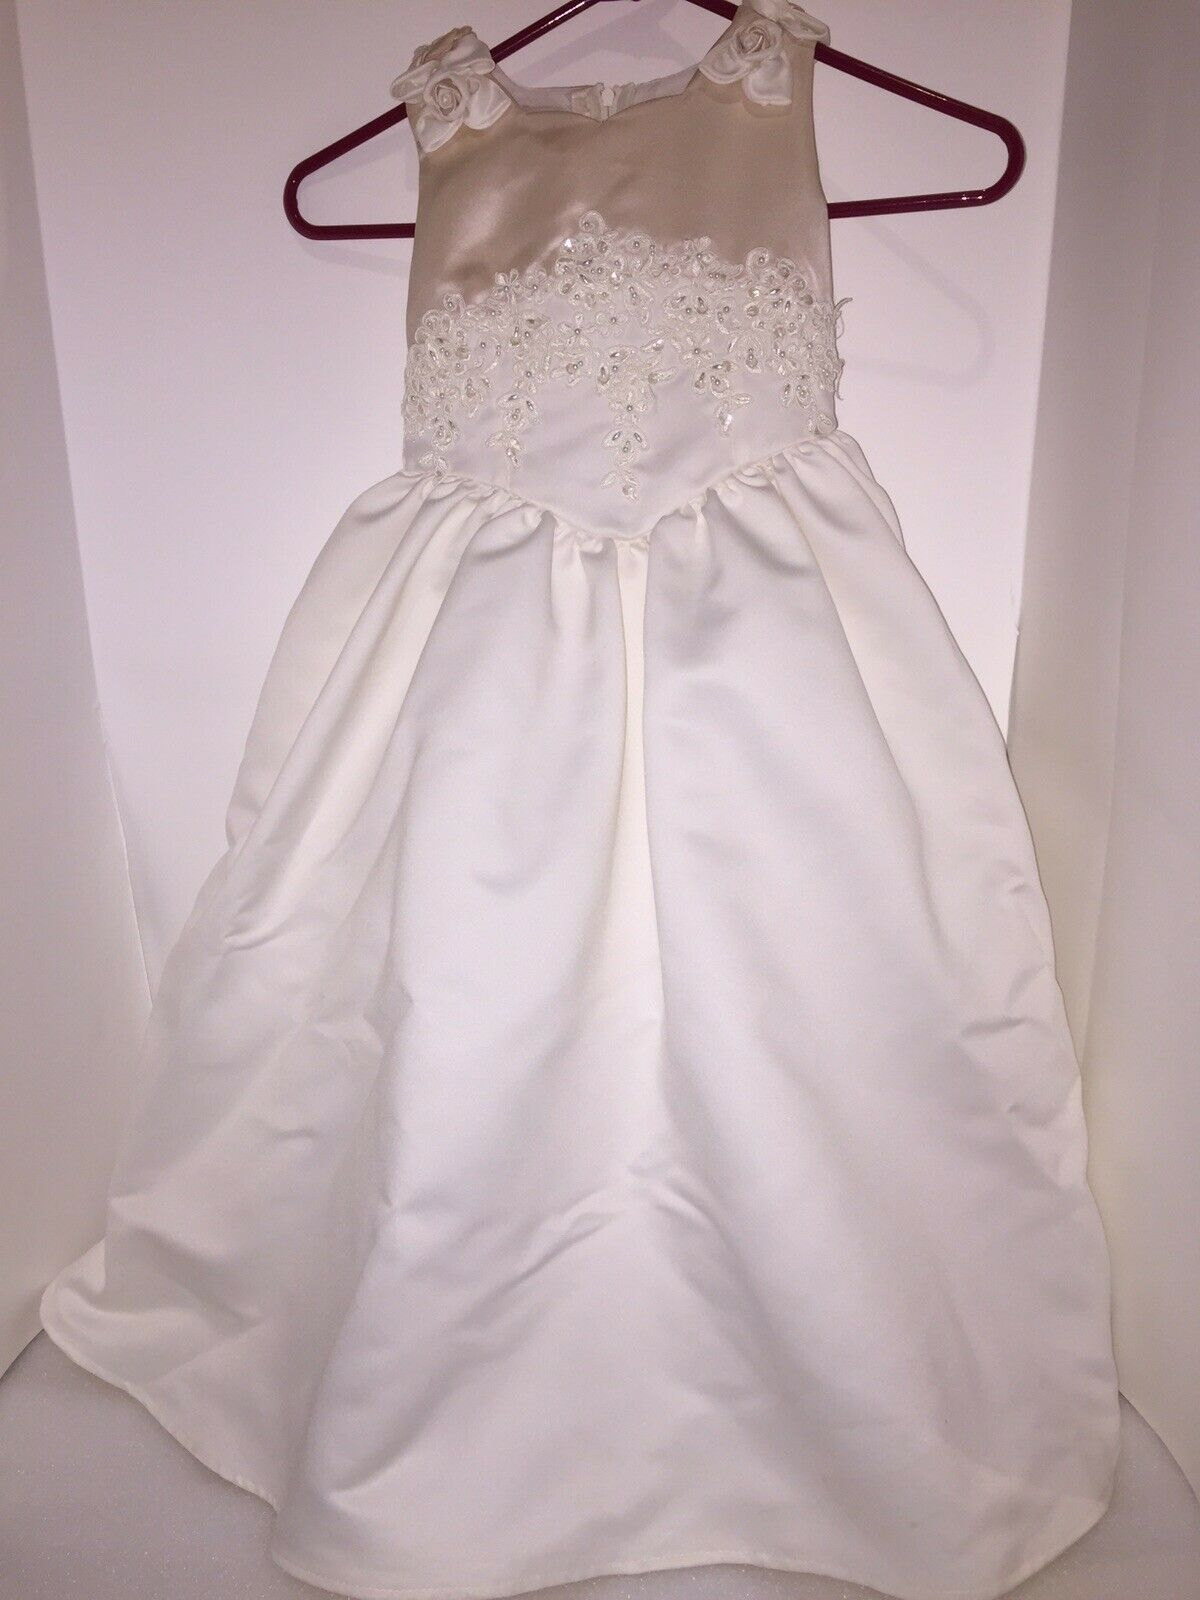 New Flower Girl Dress Size 4 Wedding Bride Bridal Basket Ring Pillow Garter